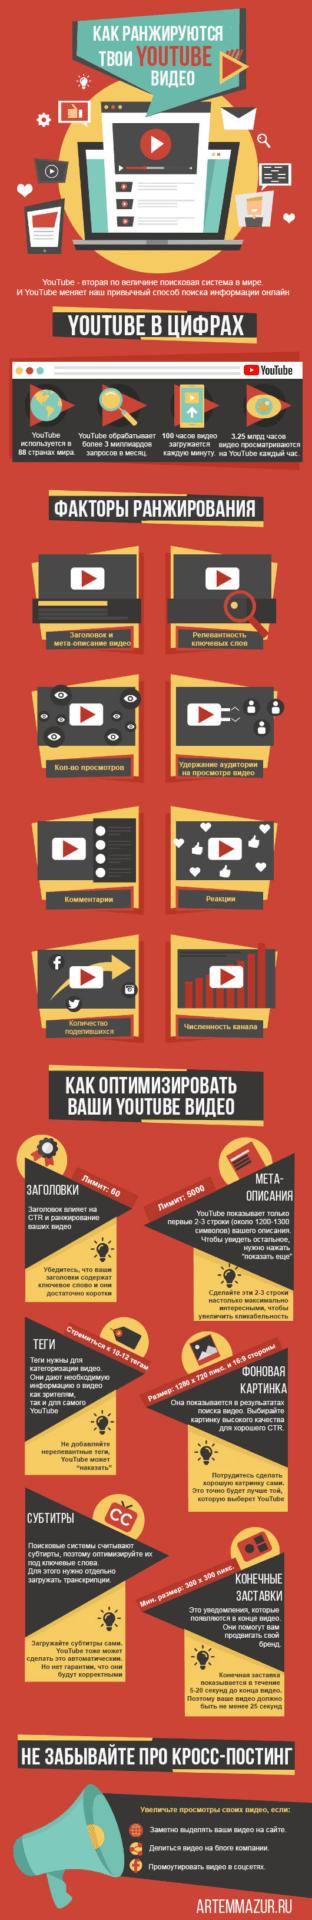 YouTube видео в результатах поиска. Инфографика